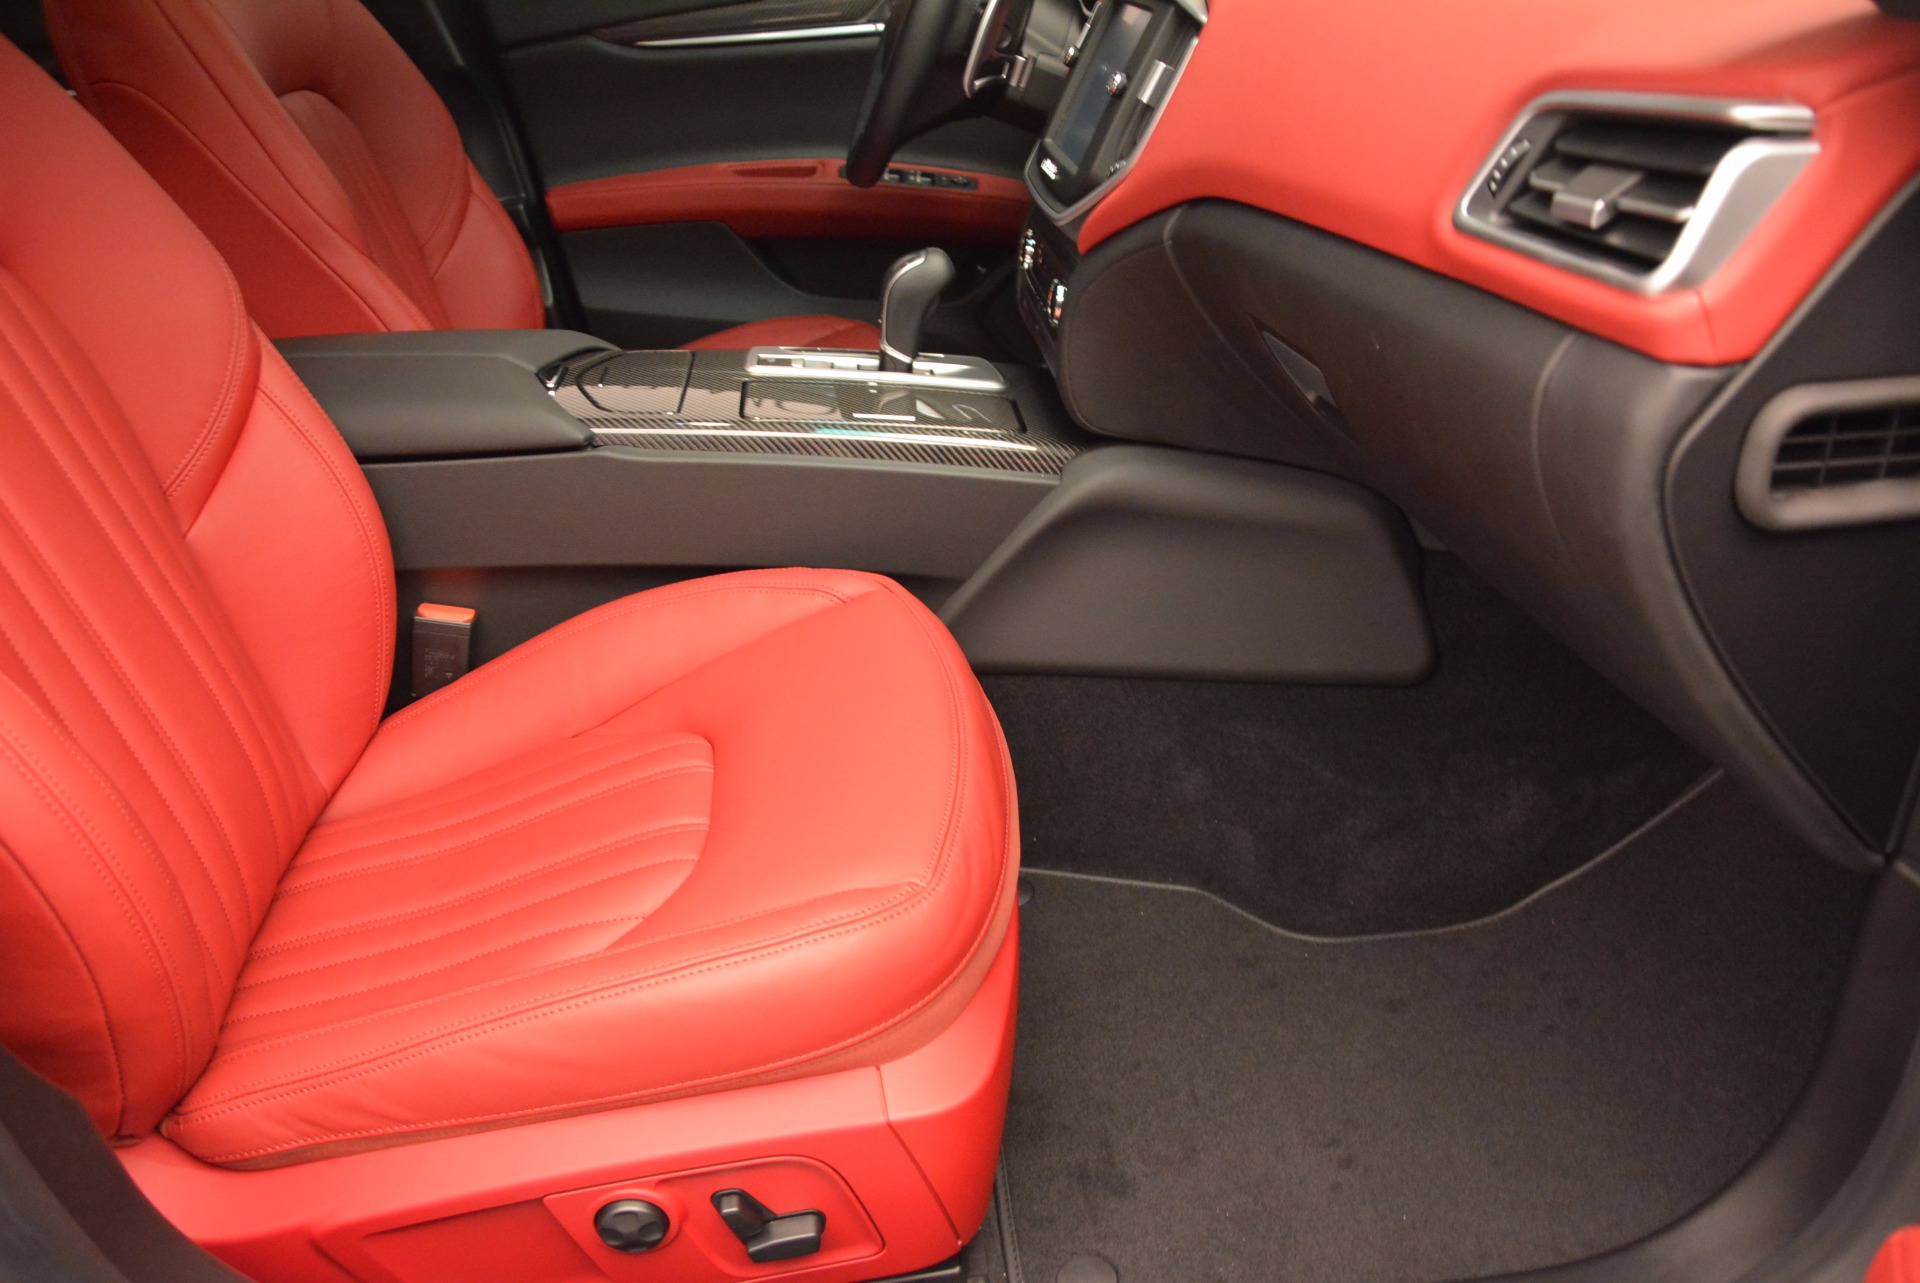 Used 2015 Maserati Ghibli S Q4 For Sale In Greenwich, CT 1290_p21